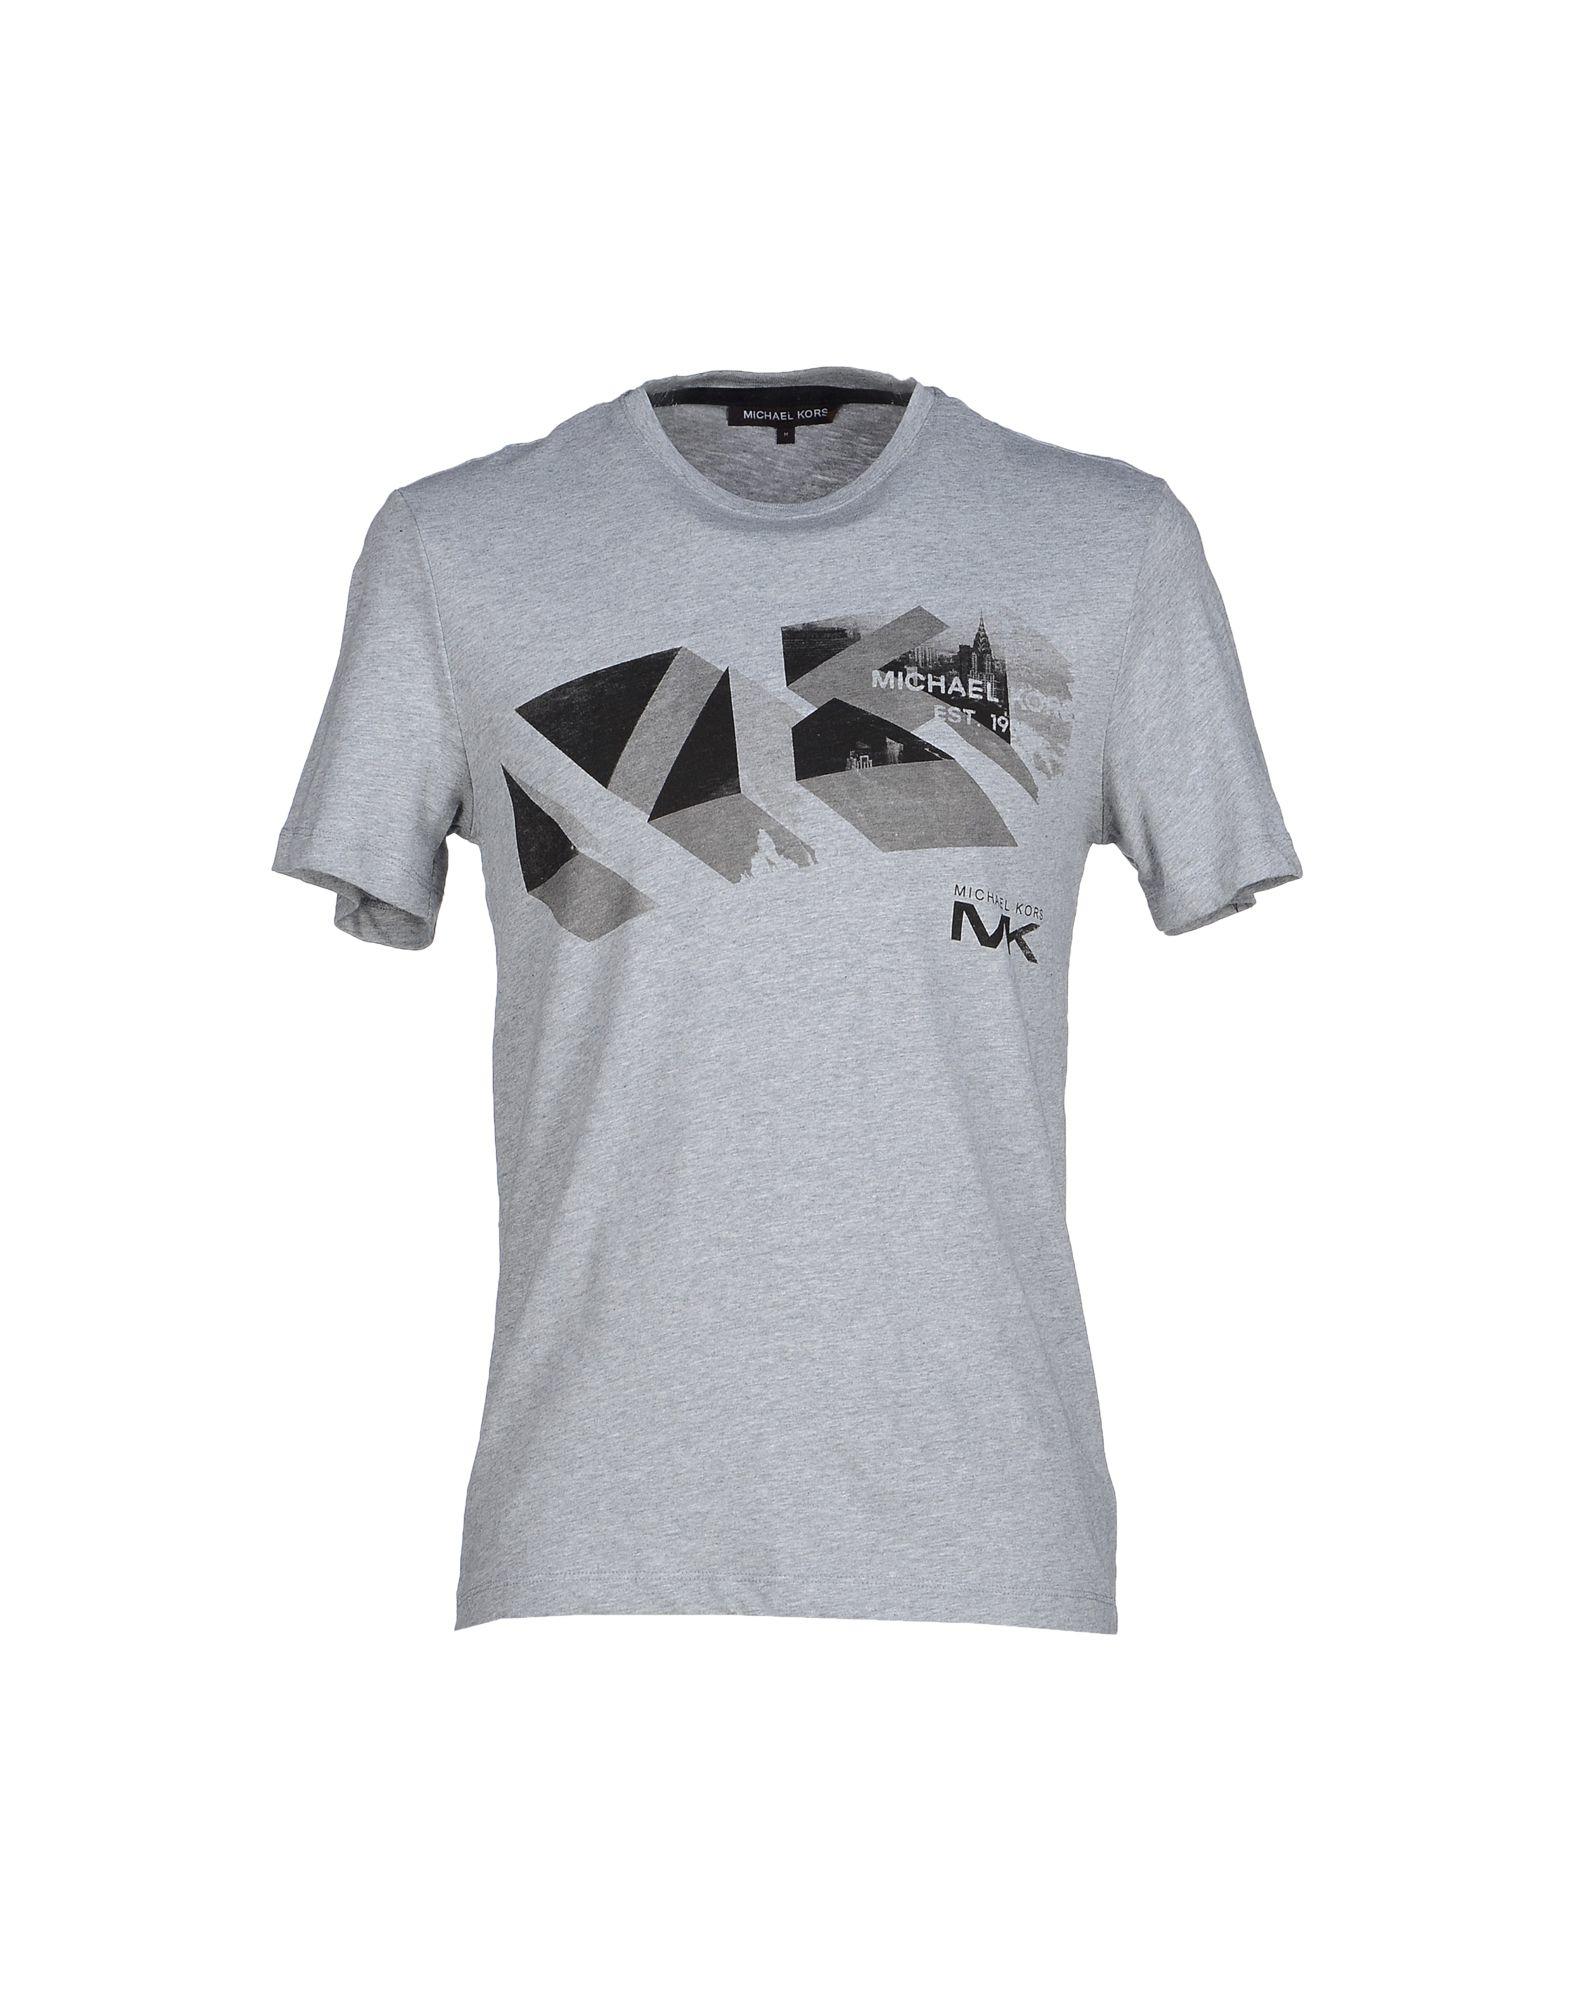 michael kors t shirt in gray for men light grey lyst. Black Bedroom Furniture Sets. Home Design Ideas